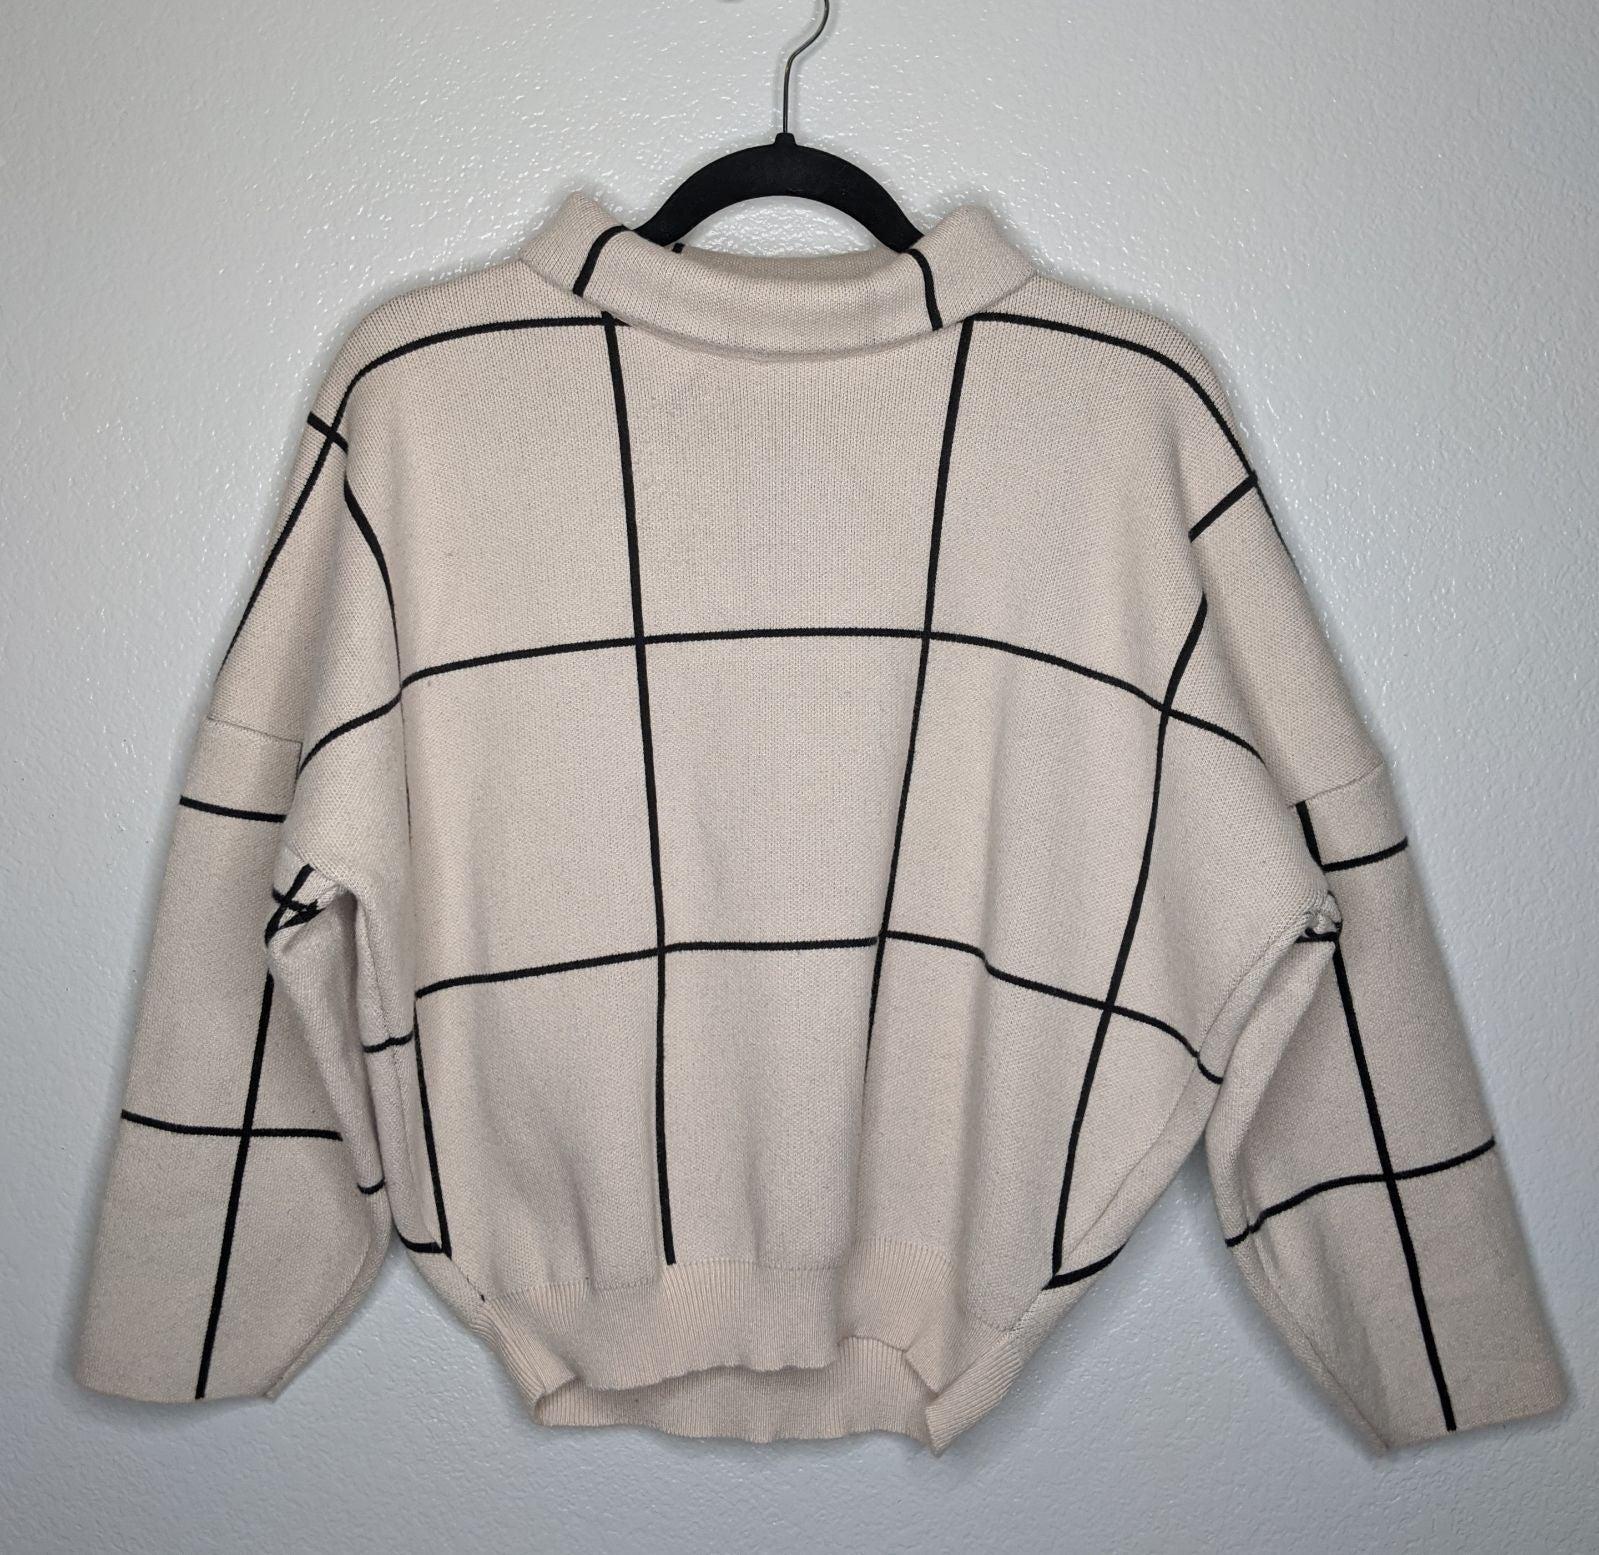 Oversized High-neck long sleeve sweater